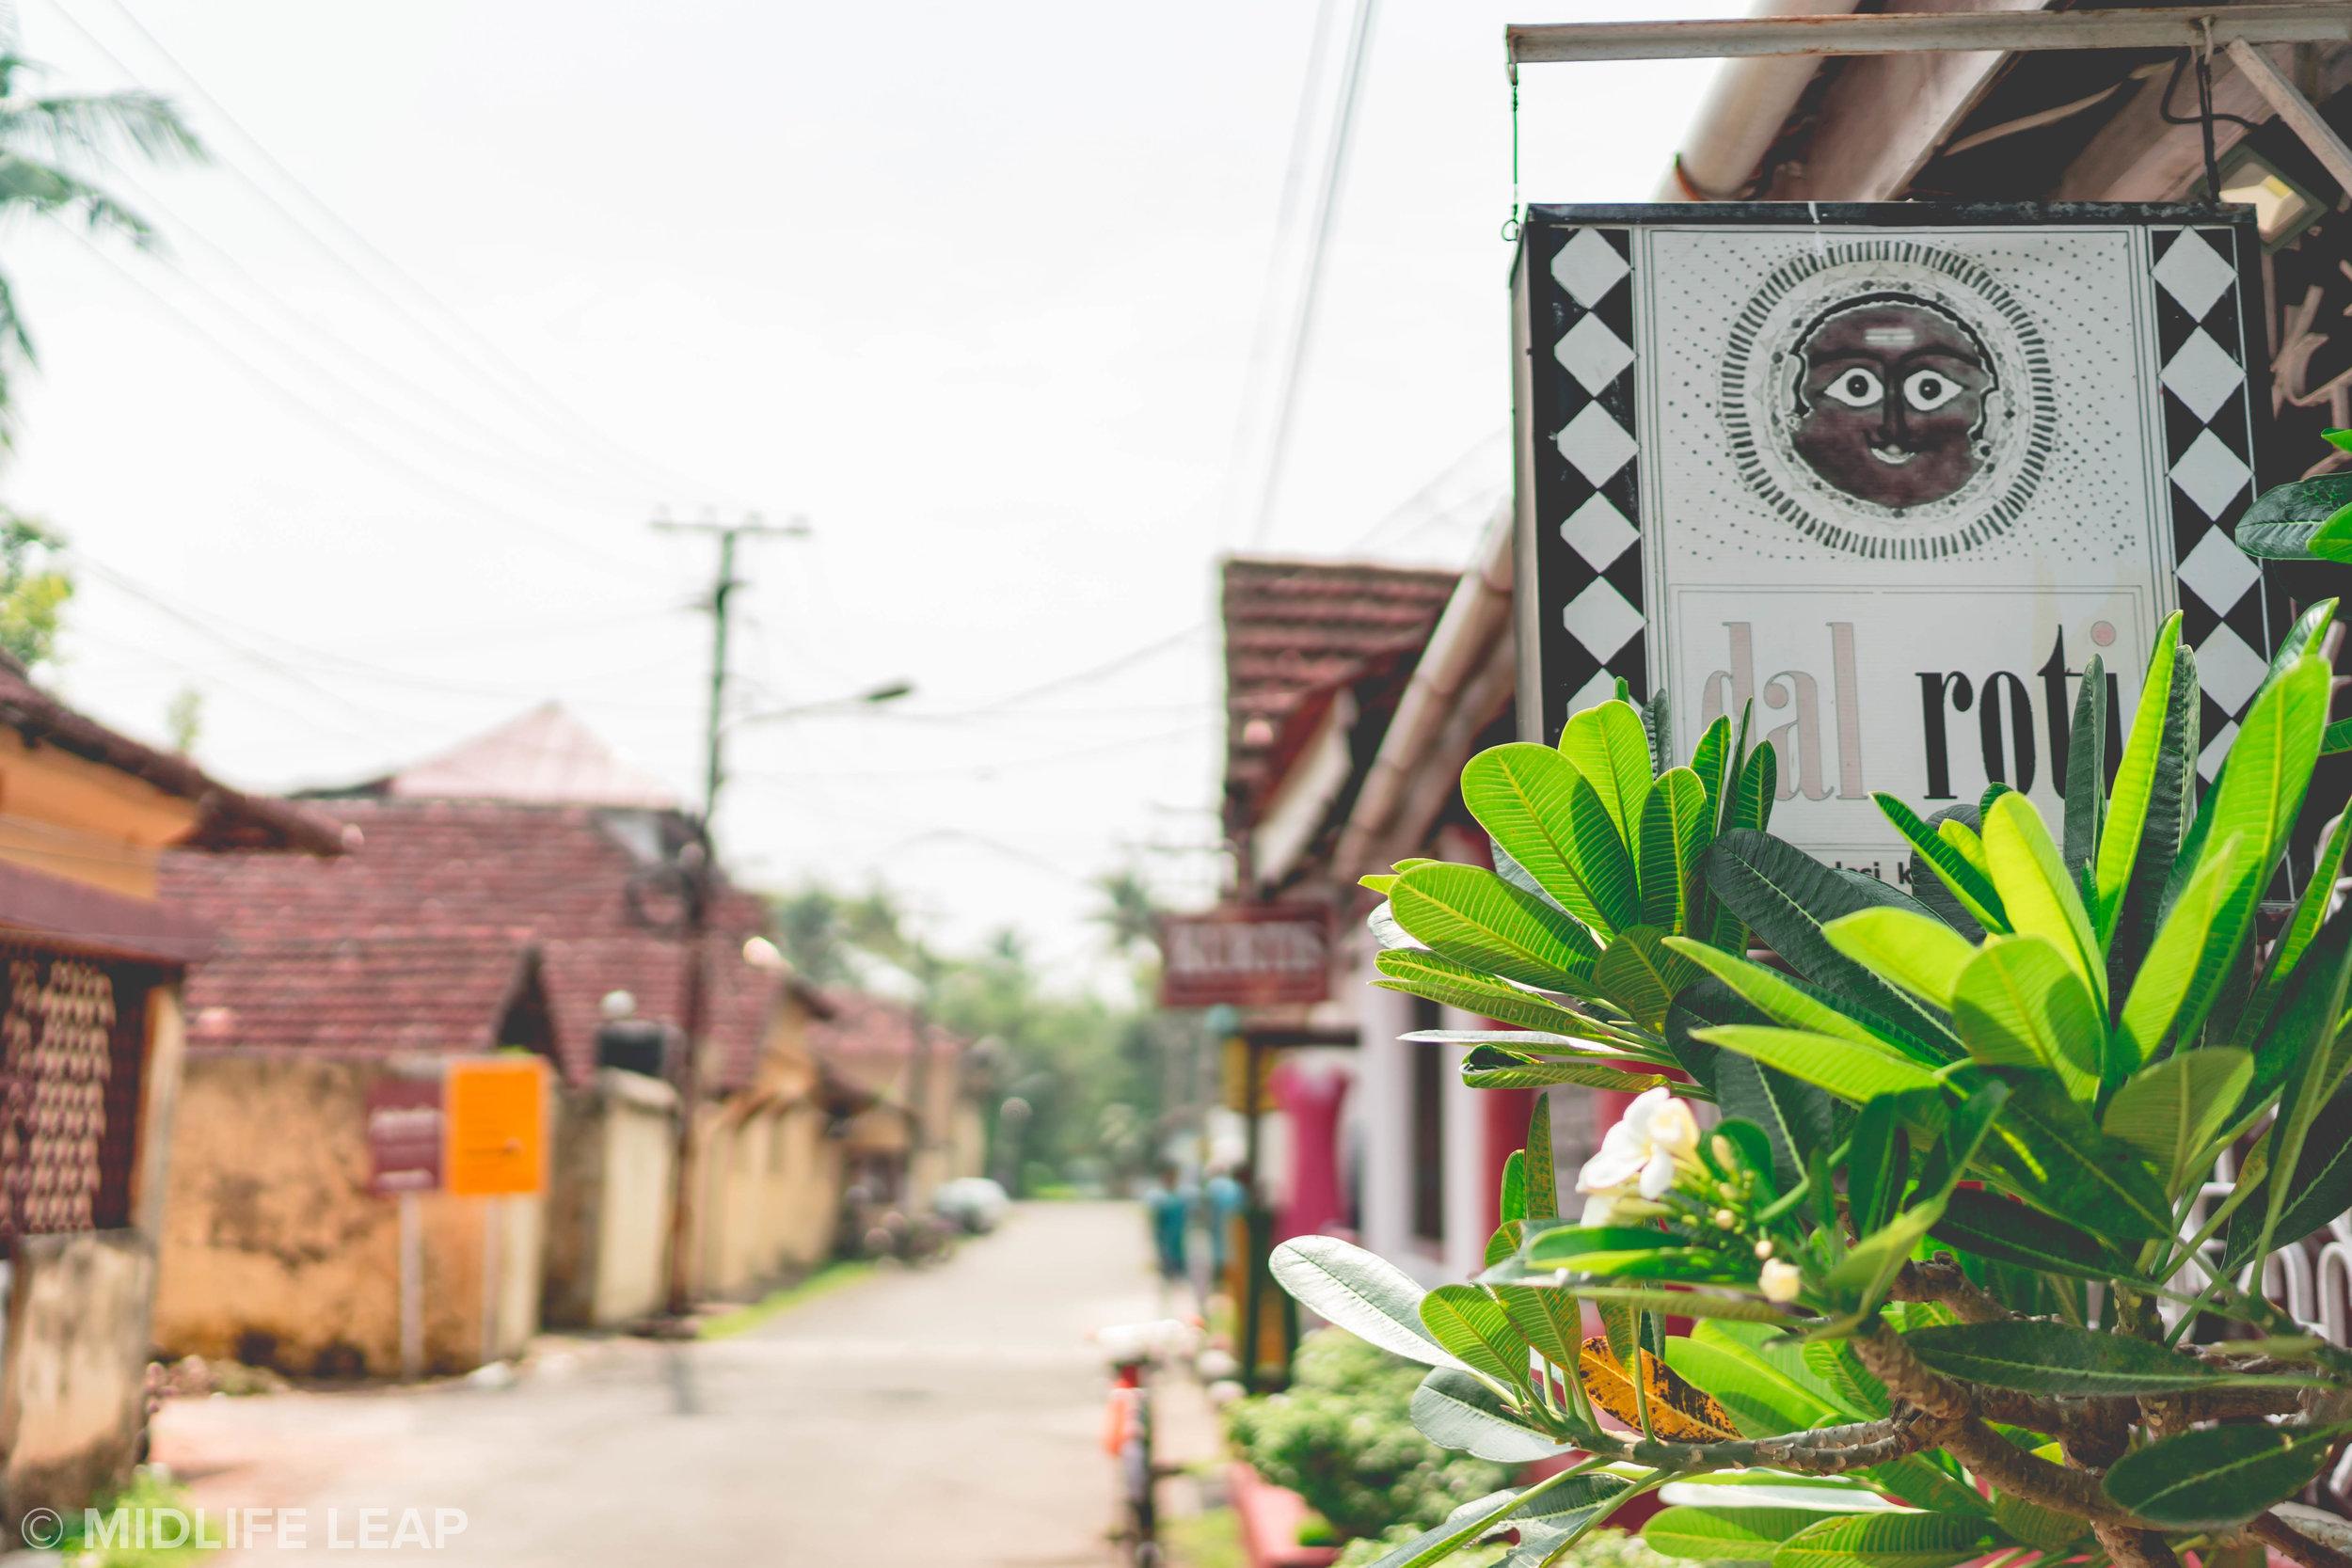 kochi-kerela-india-dal-roti-restaurant